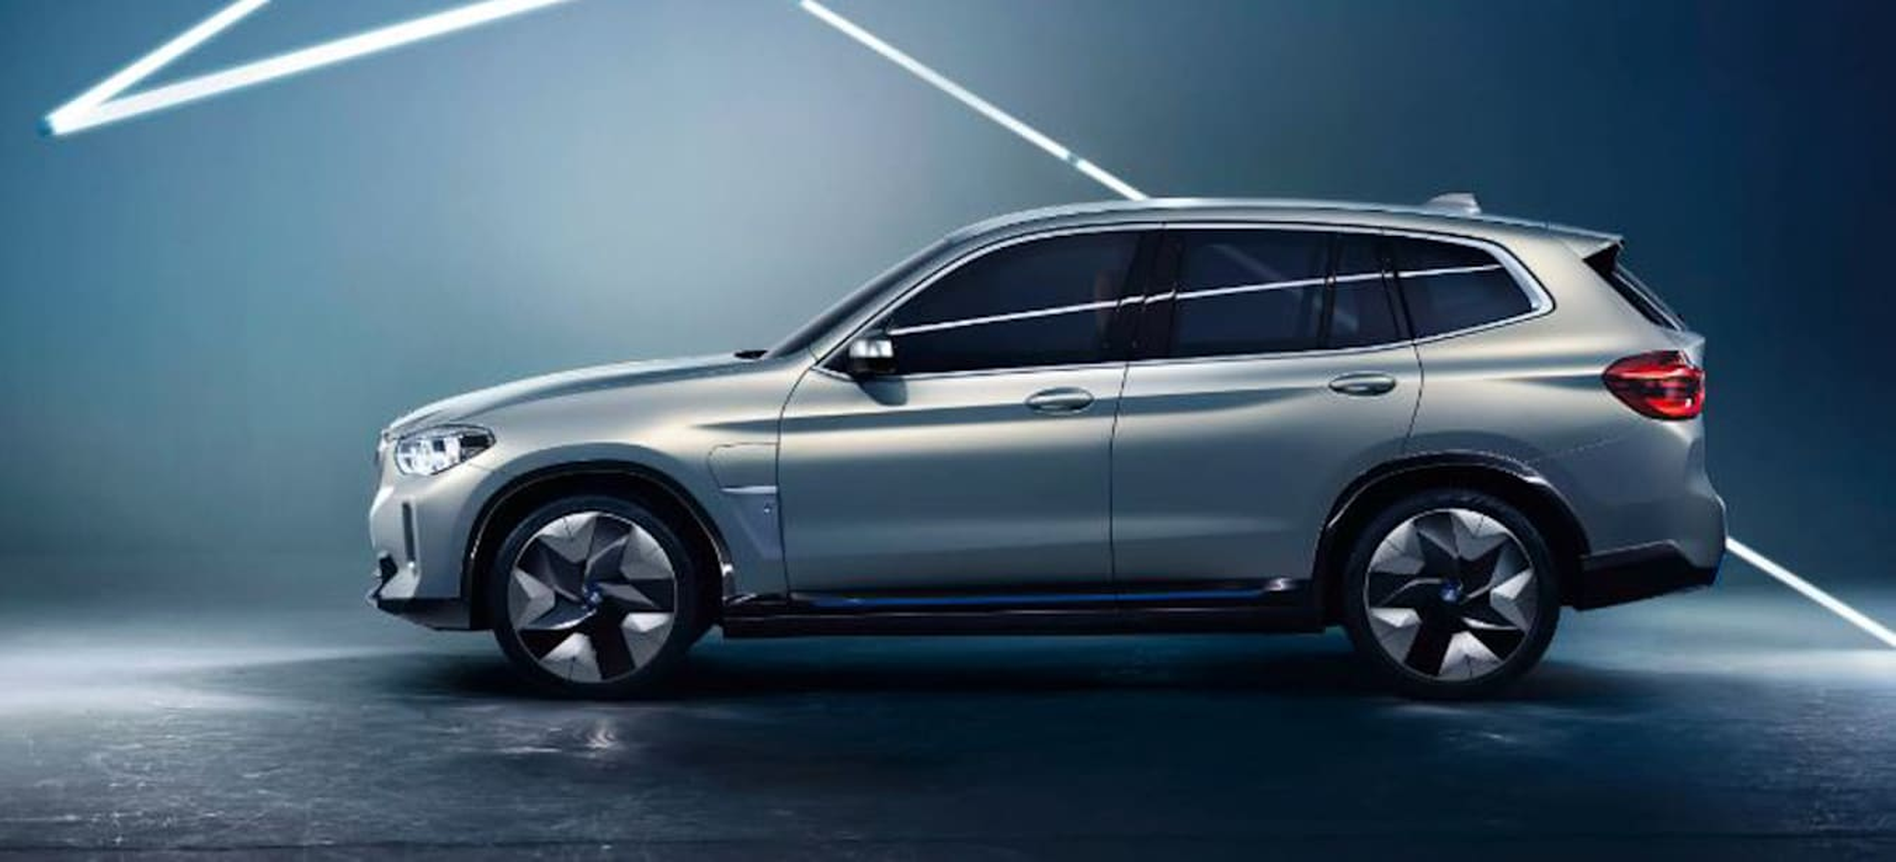 2020 BMW iX3 confirmed